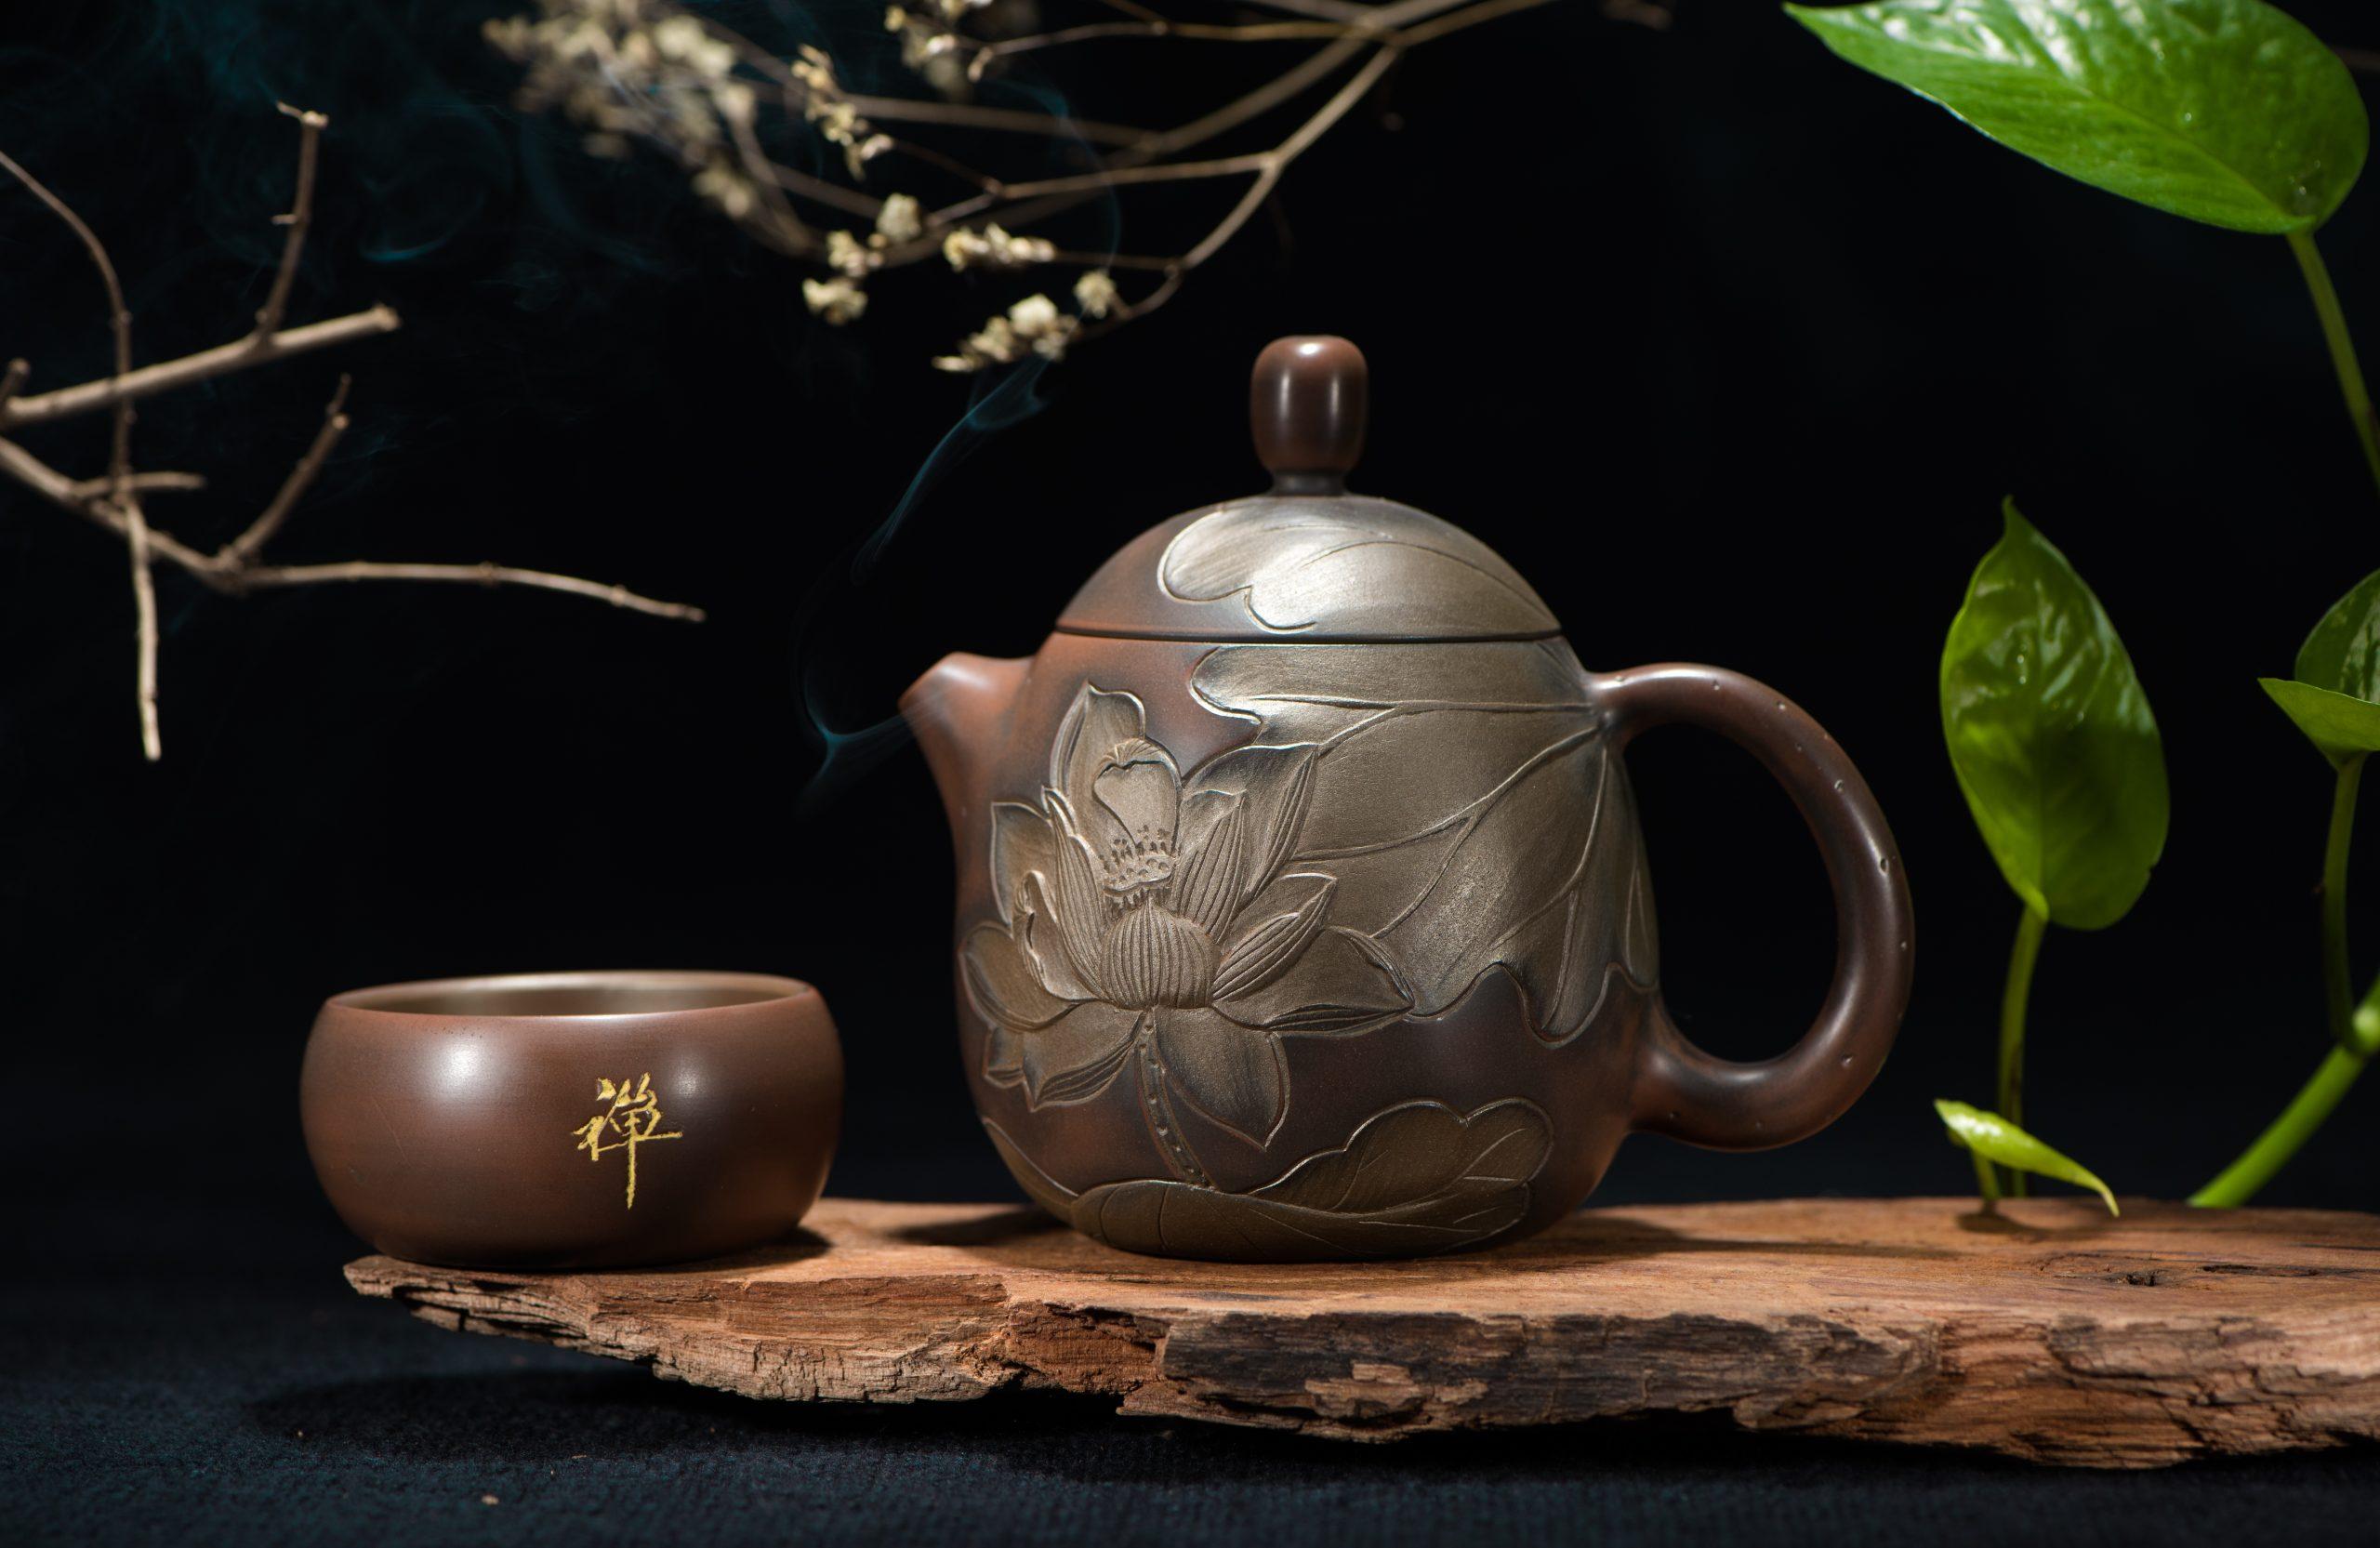 teapot ceramic lighting still life painting tea set art tea ceremony still life photography  scaled